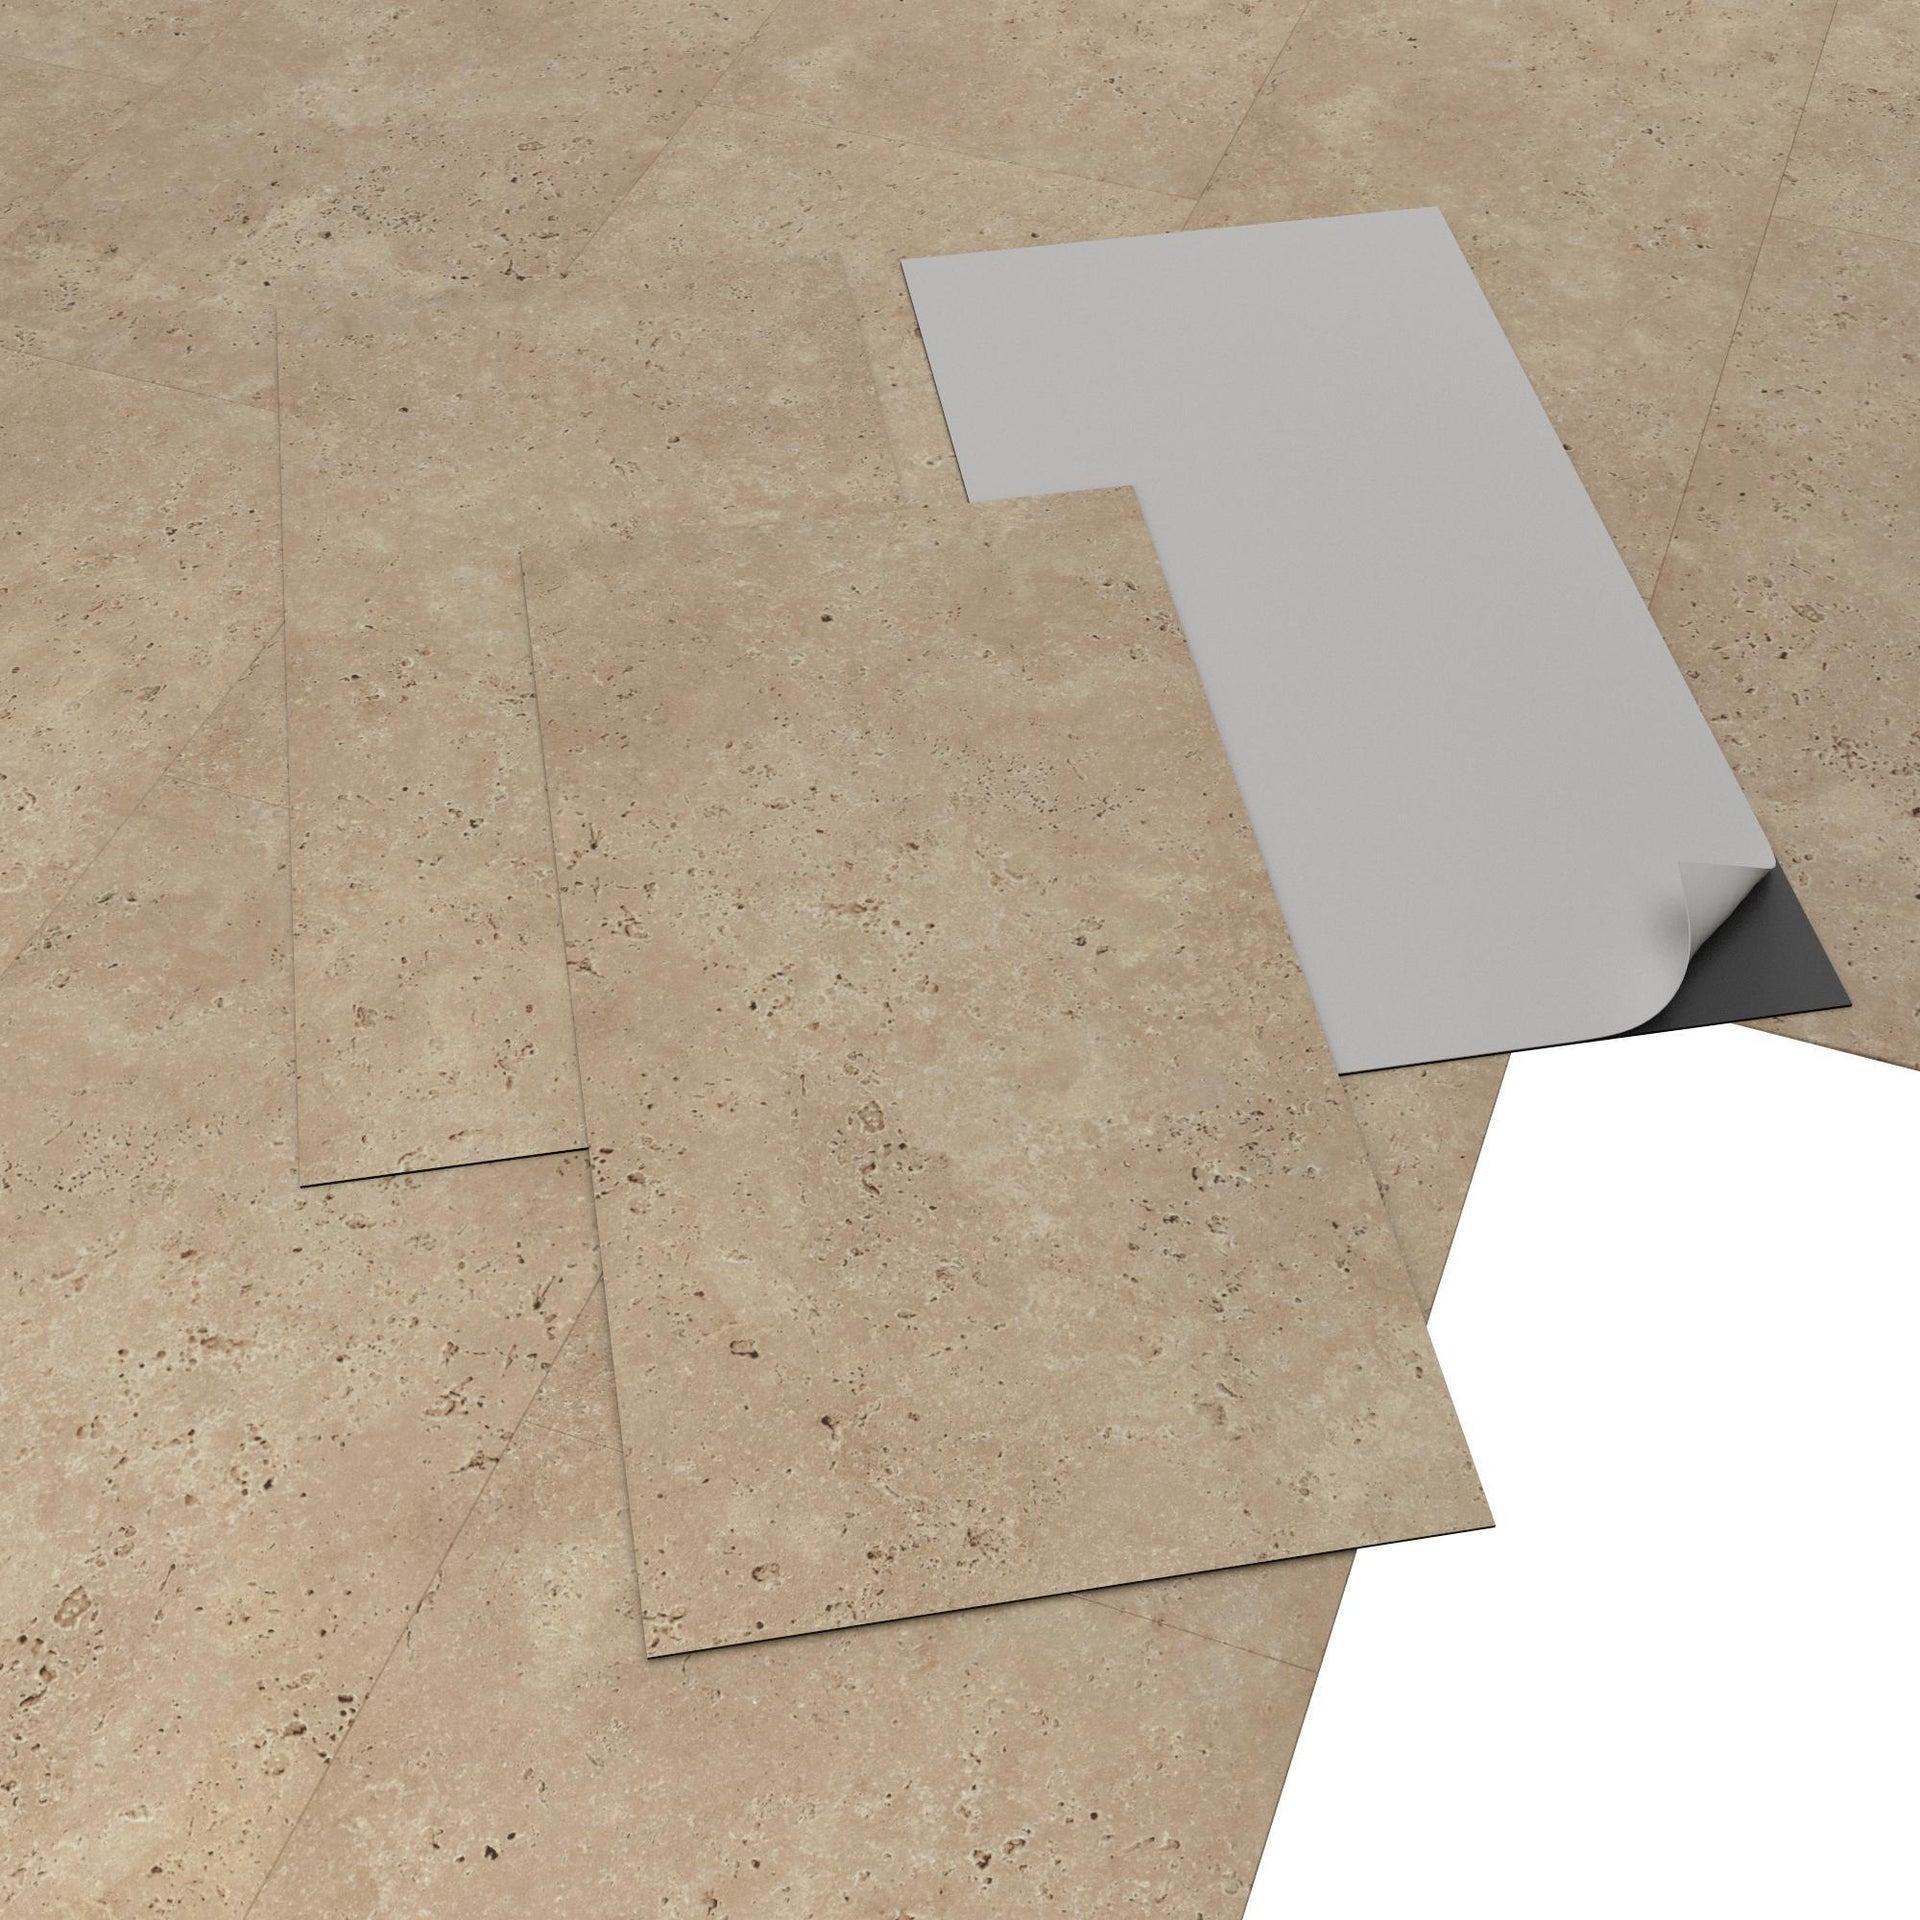 Pavimento PVC adesivo Travertino Sp 1.5 mm beige - 2